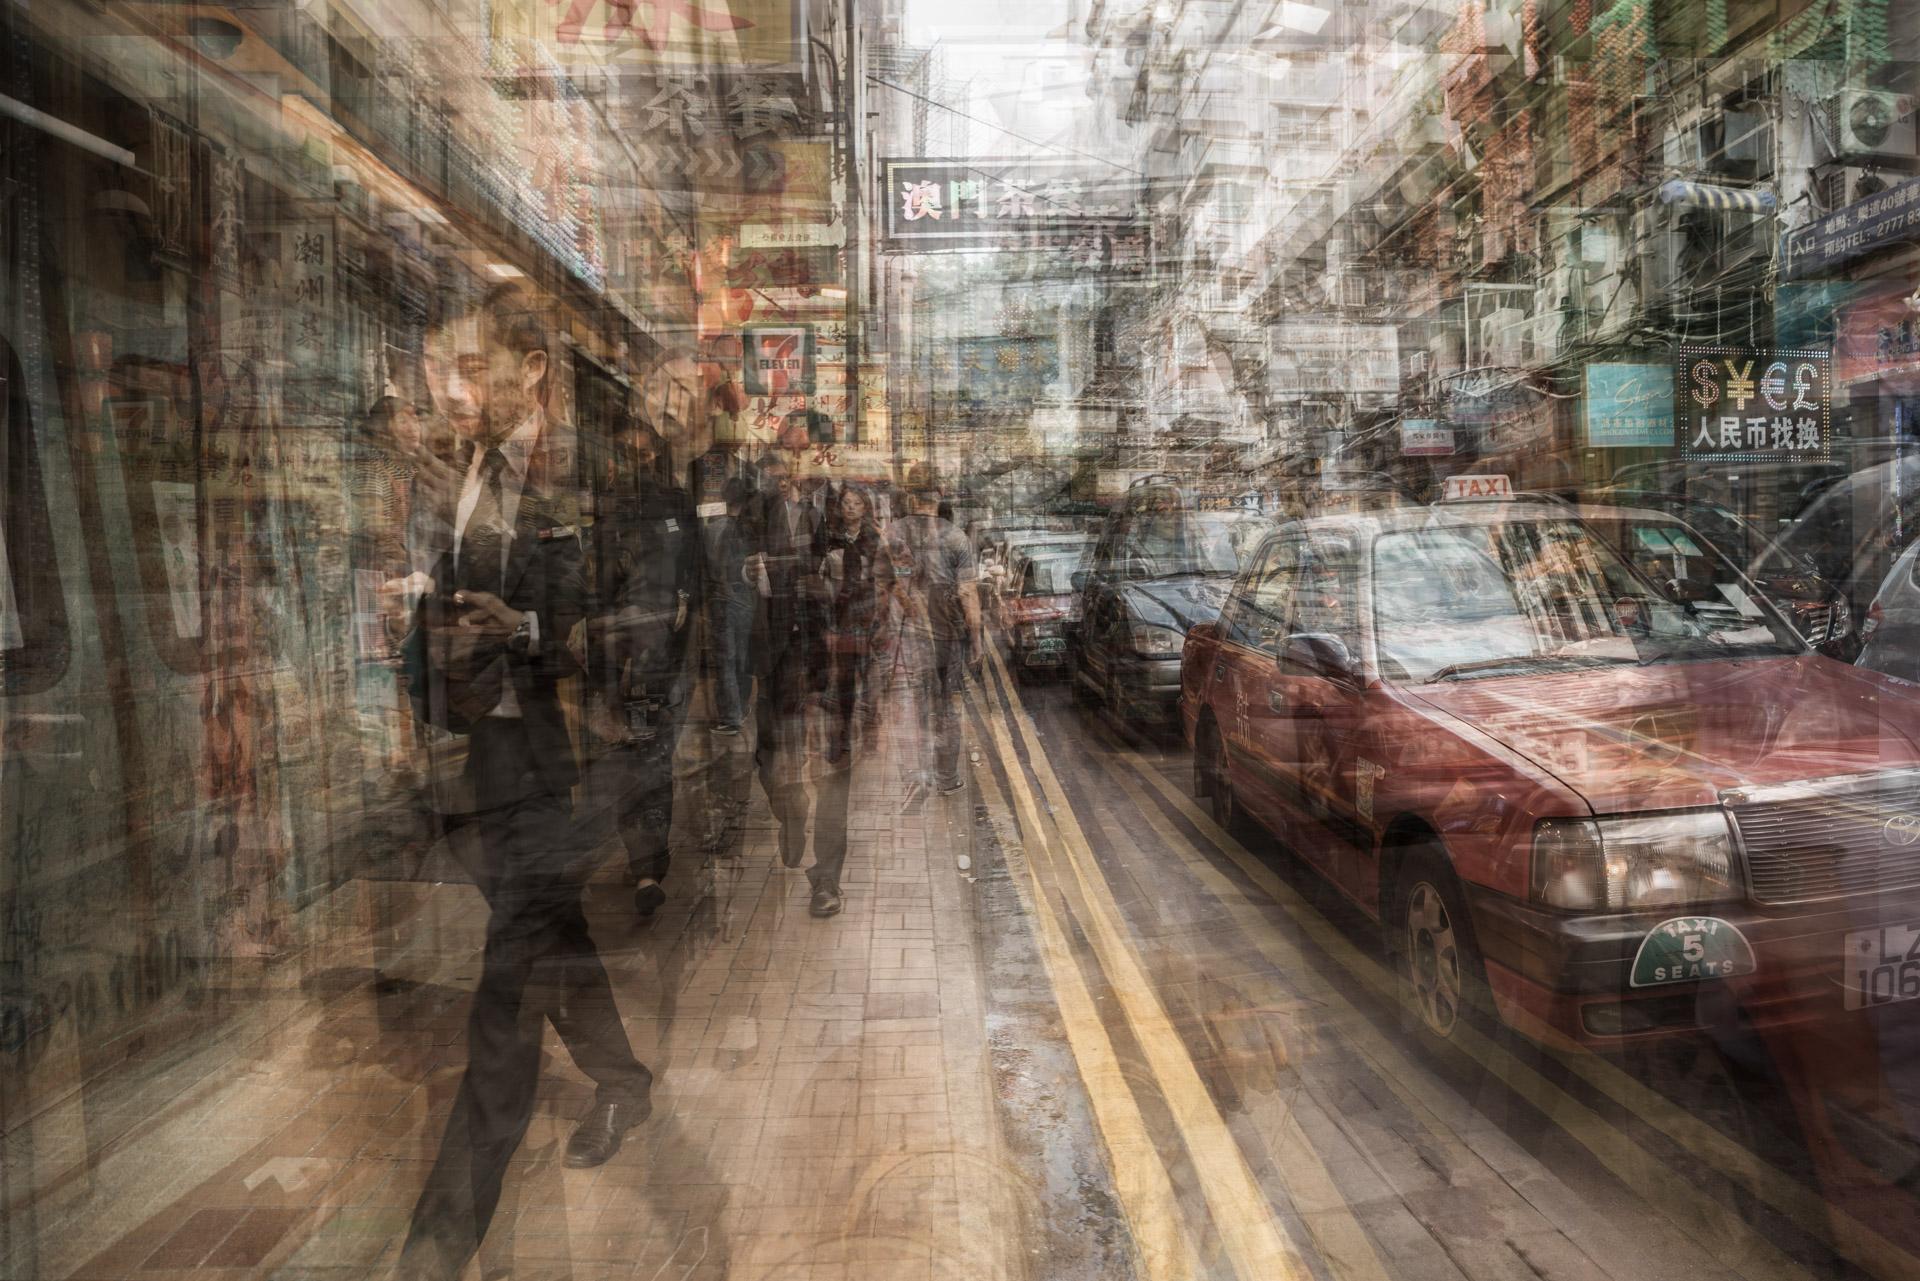 Tsim Sha Tsui - HK series -Riccardo Magherini.jpg